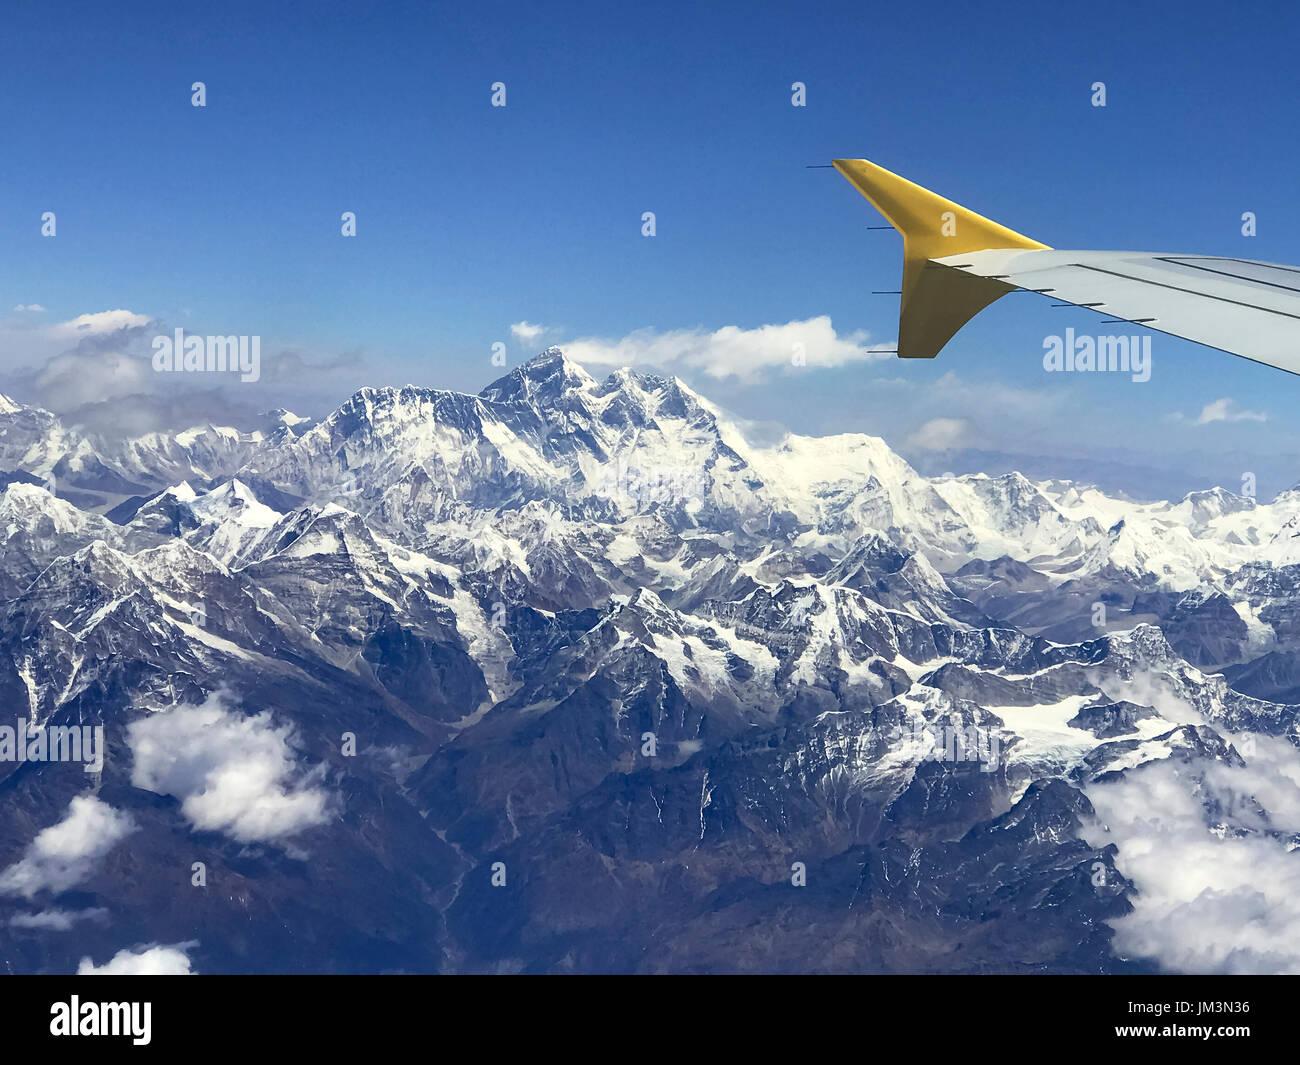 Bhutan.. Himalayas. - Stock Image